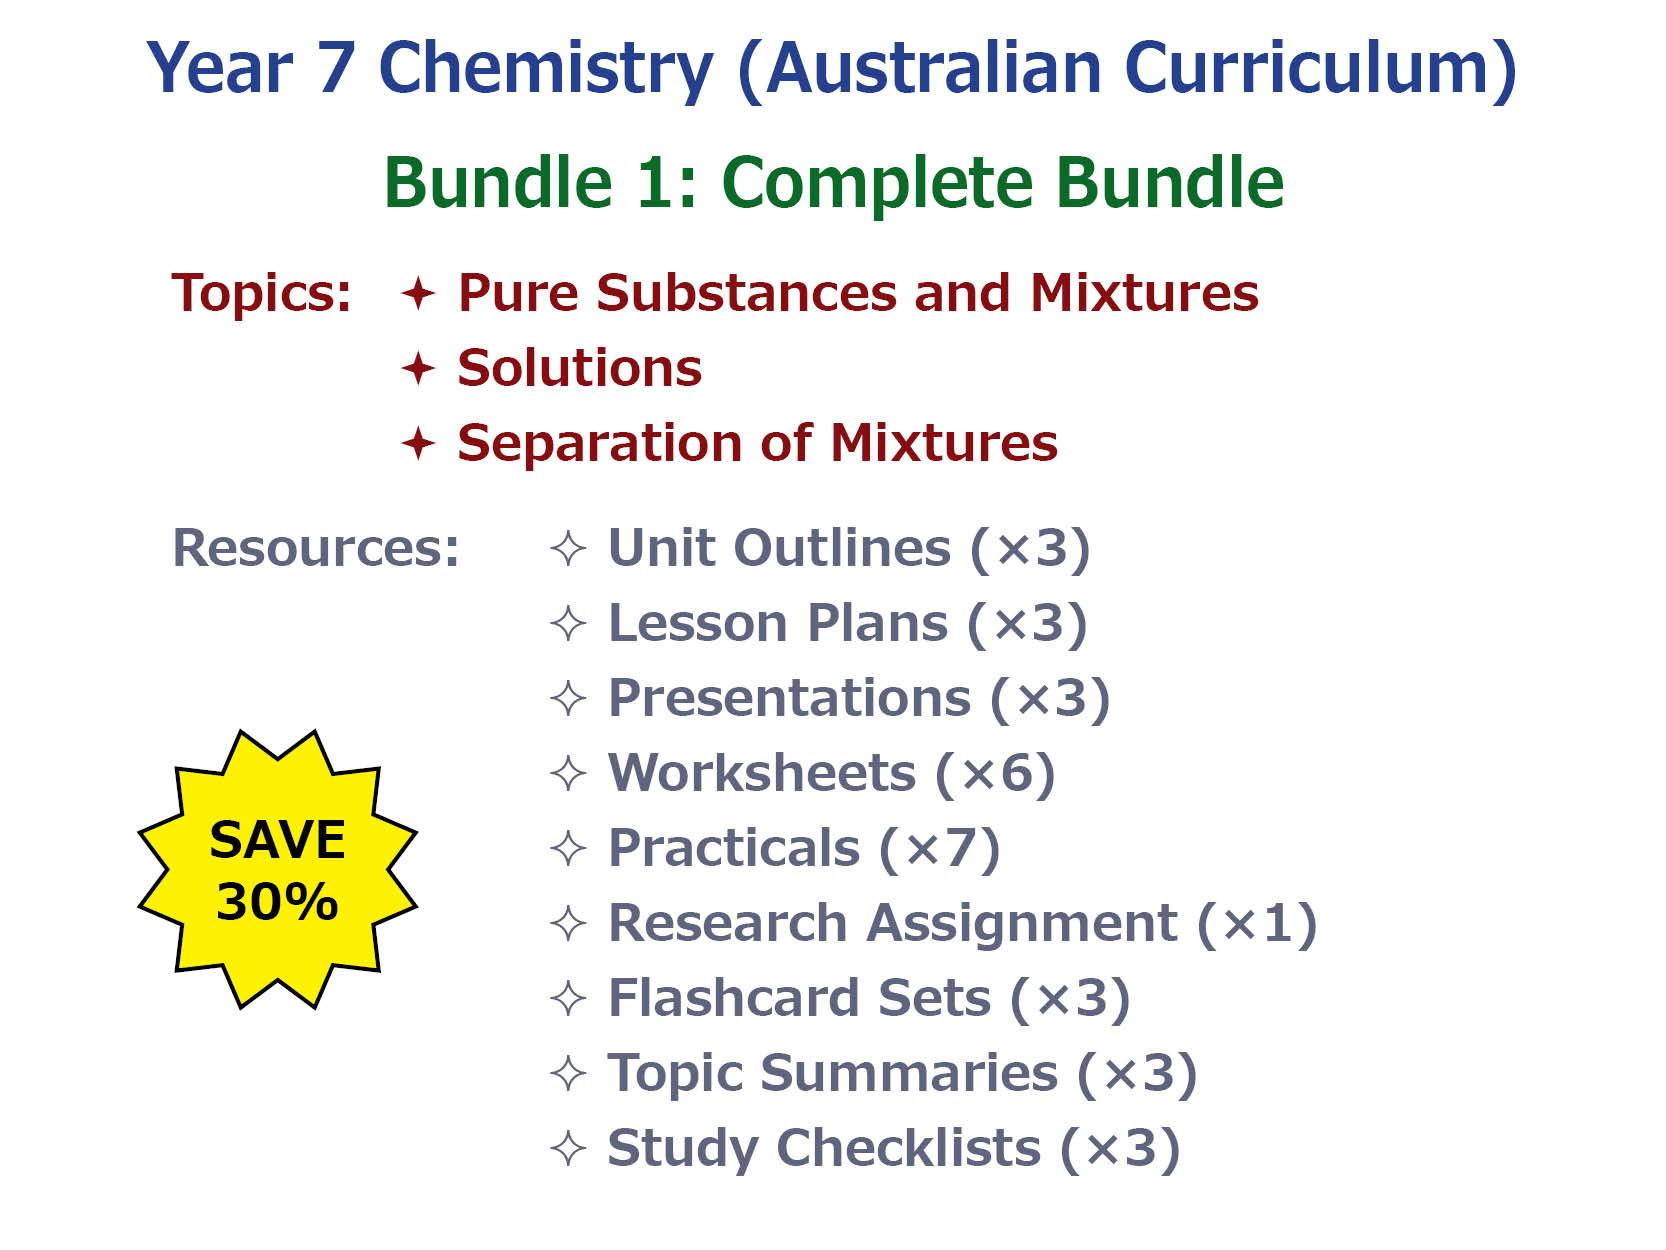 7AU Chemistry: Complete Bundle